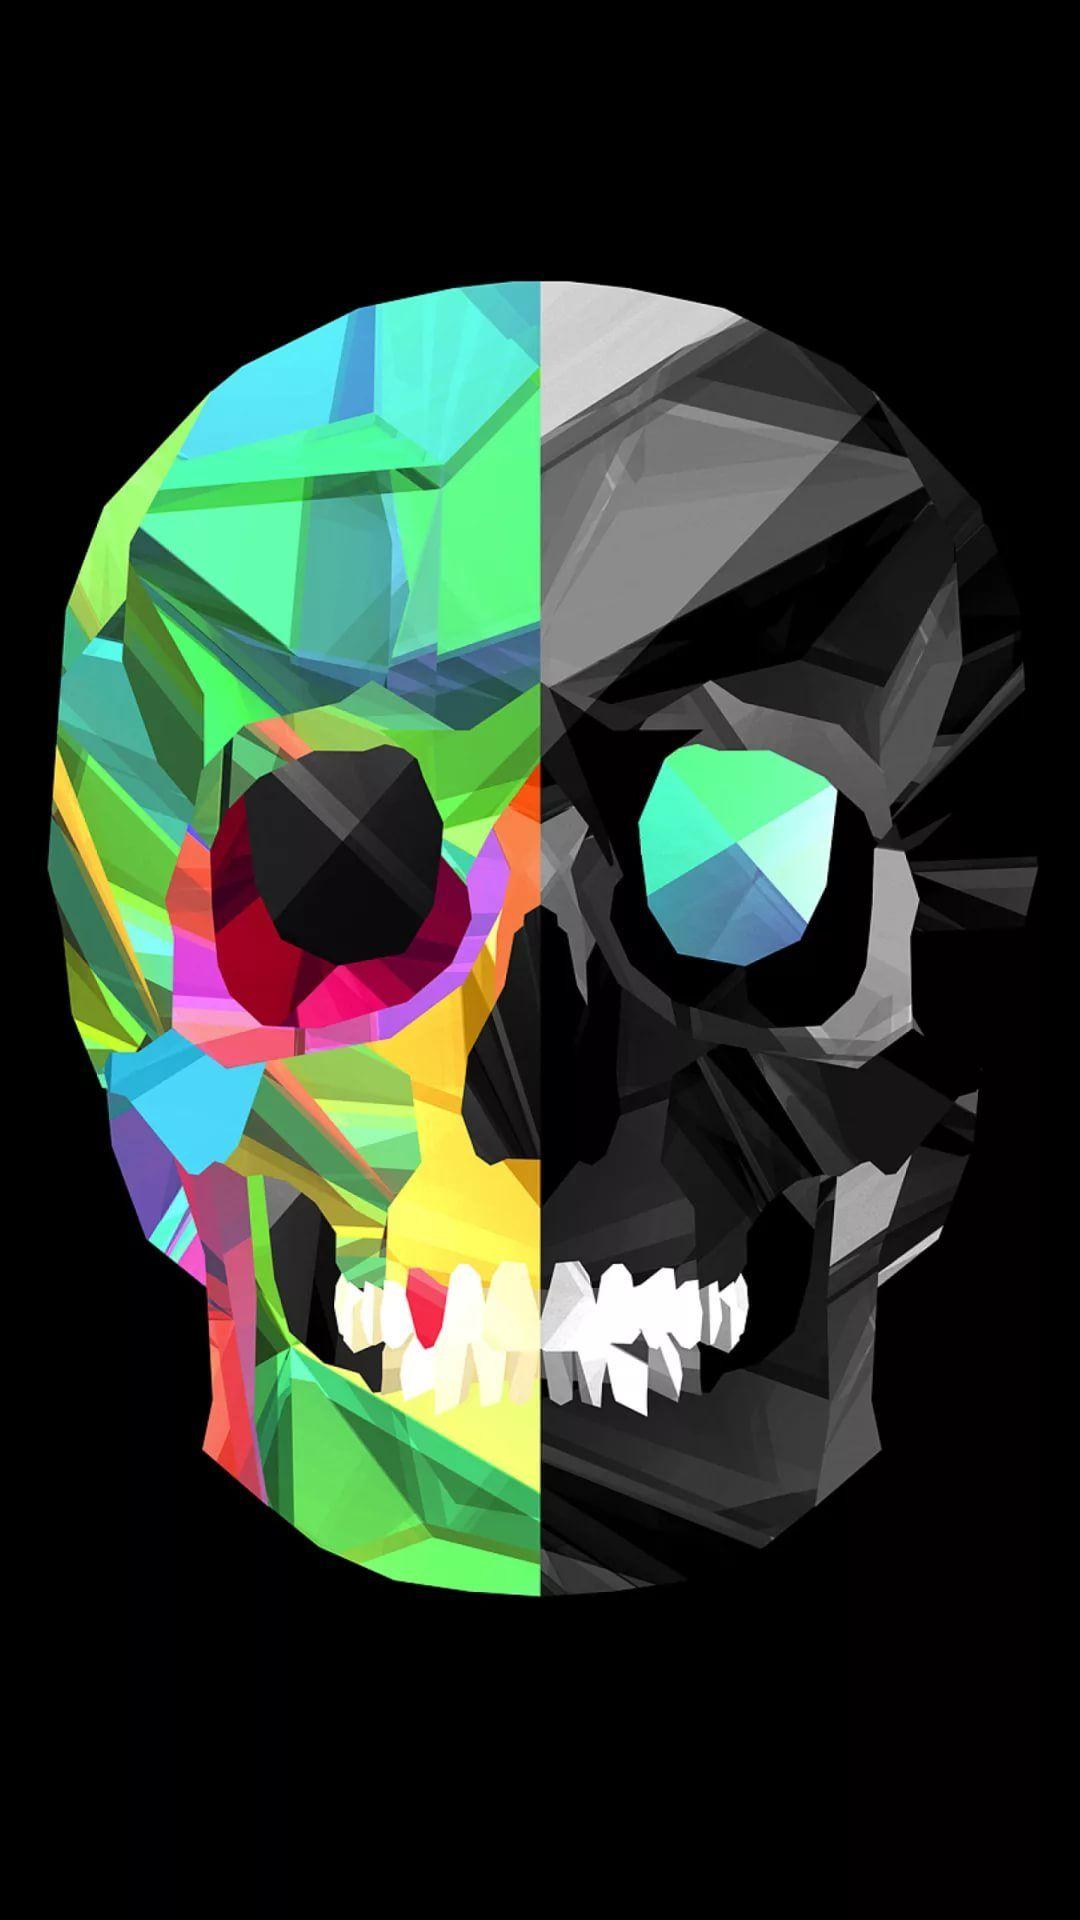 Cool Skull cool phone wallpaper